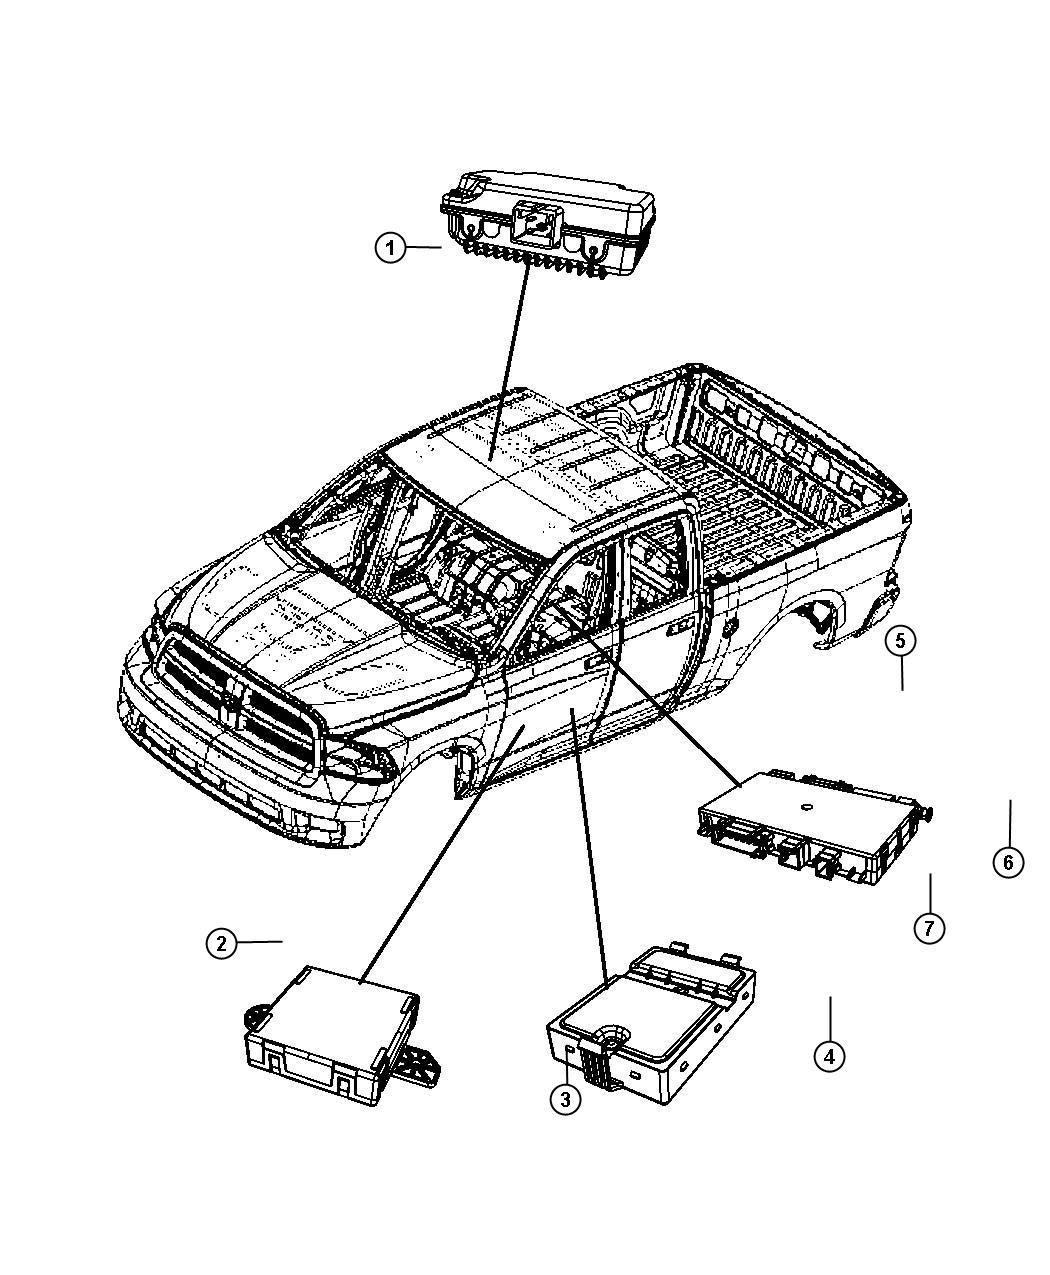 Ram Modulesel Exhaust Fluid Selective